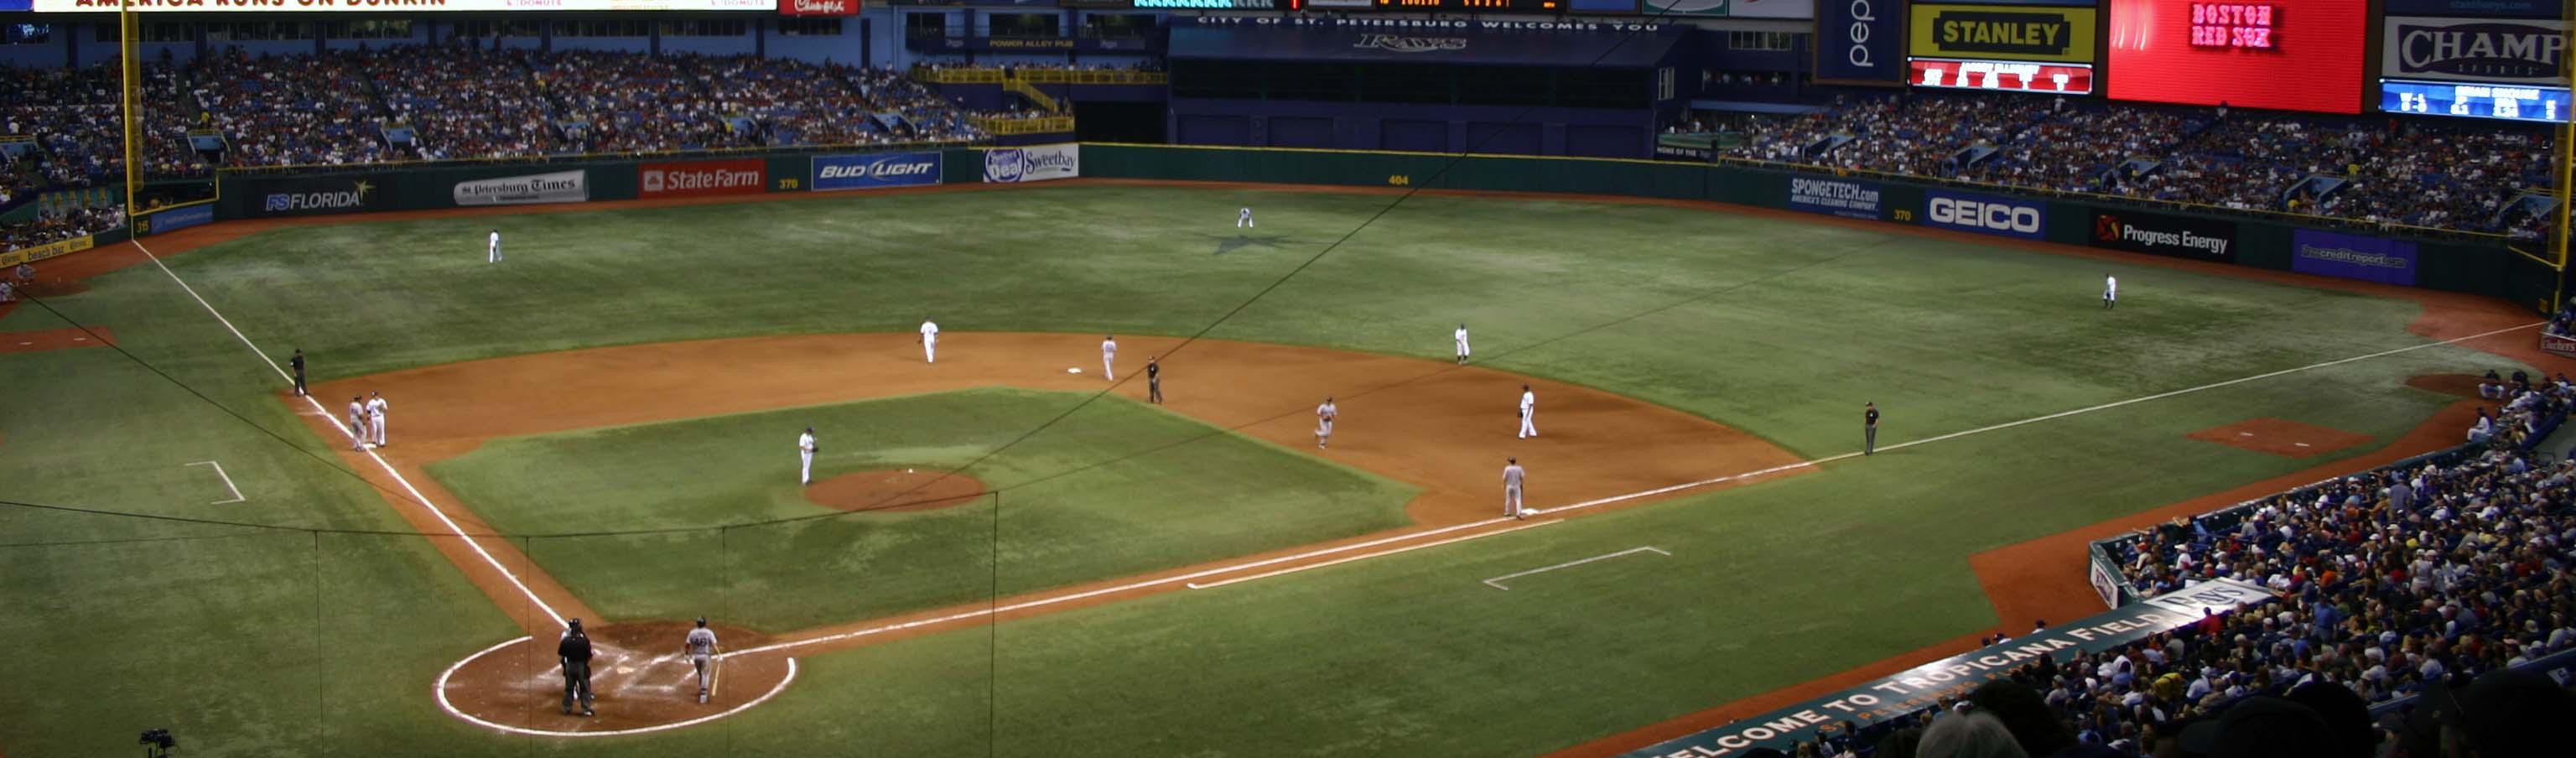 Tropicana_Field_Field_View.jpg